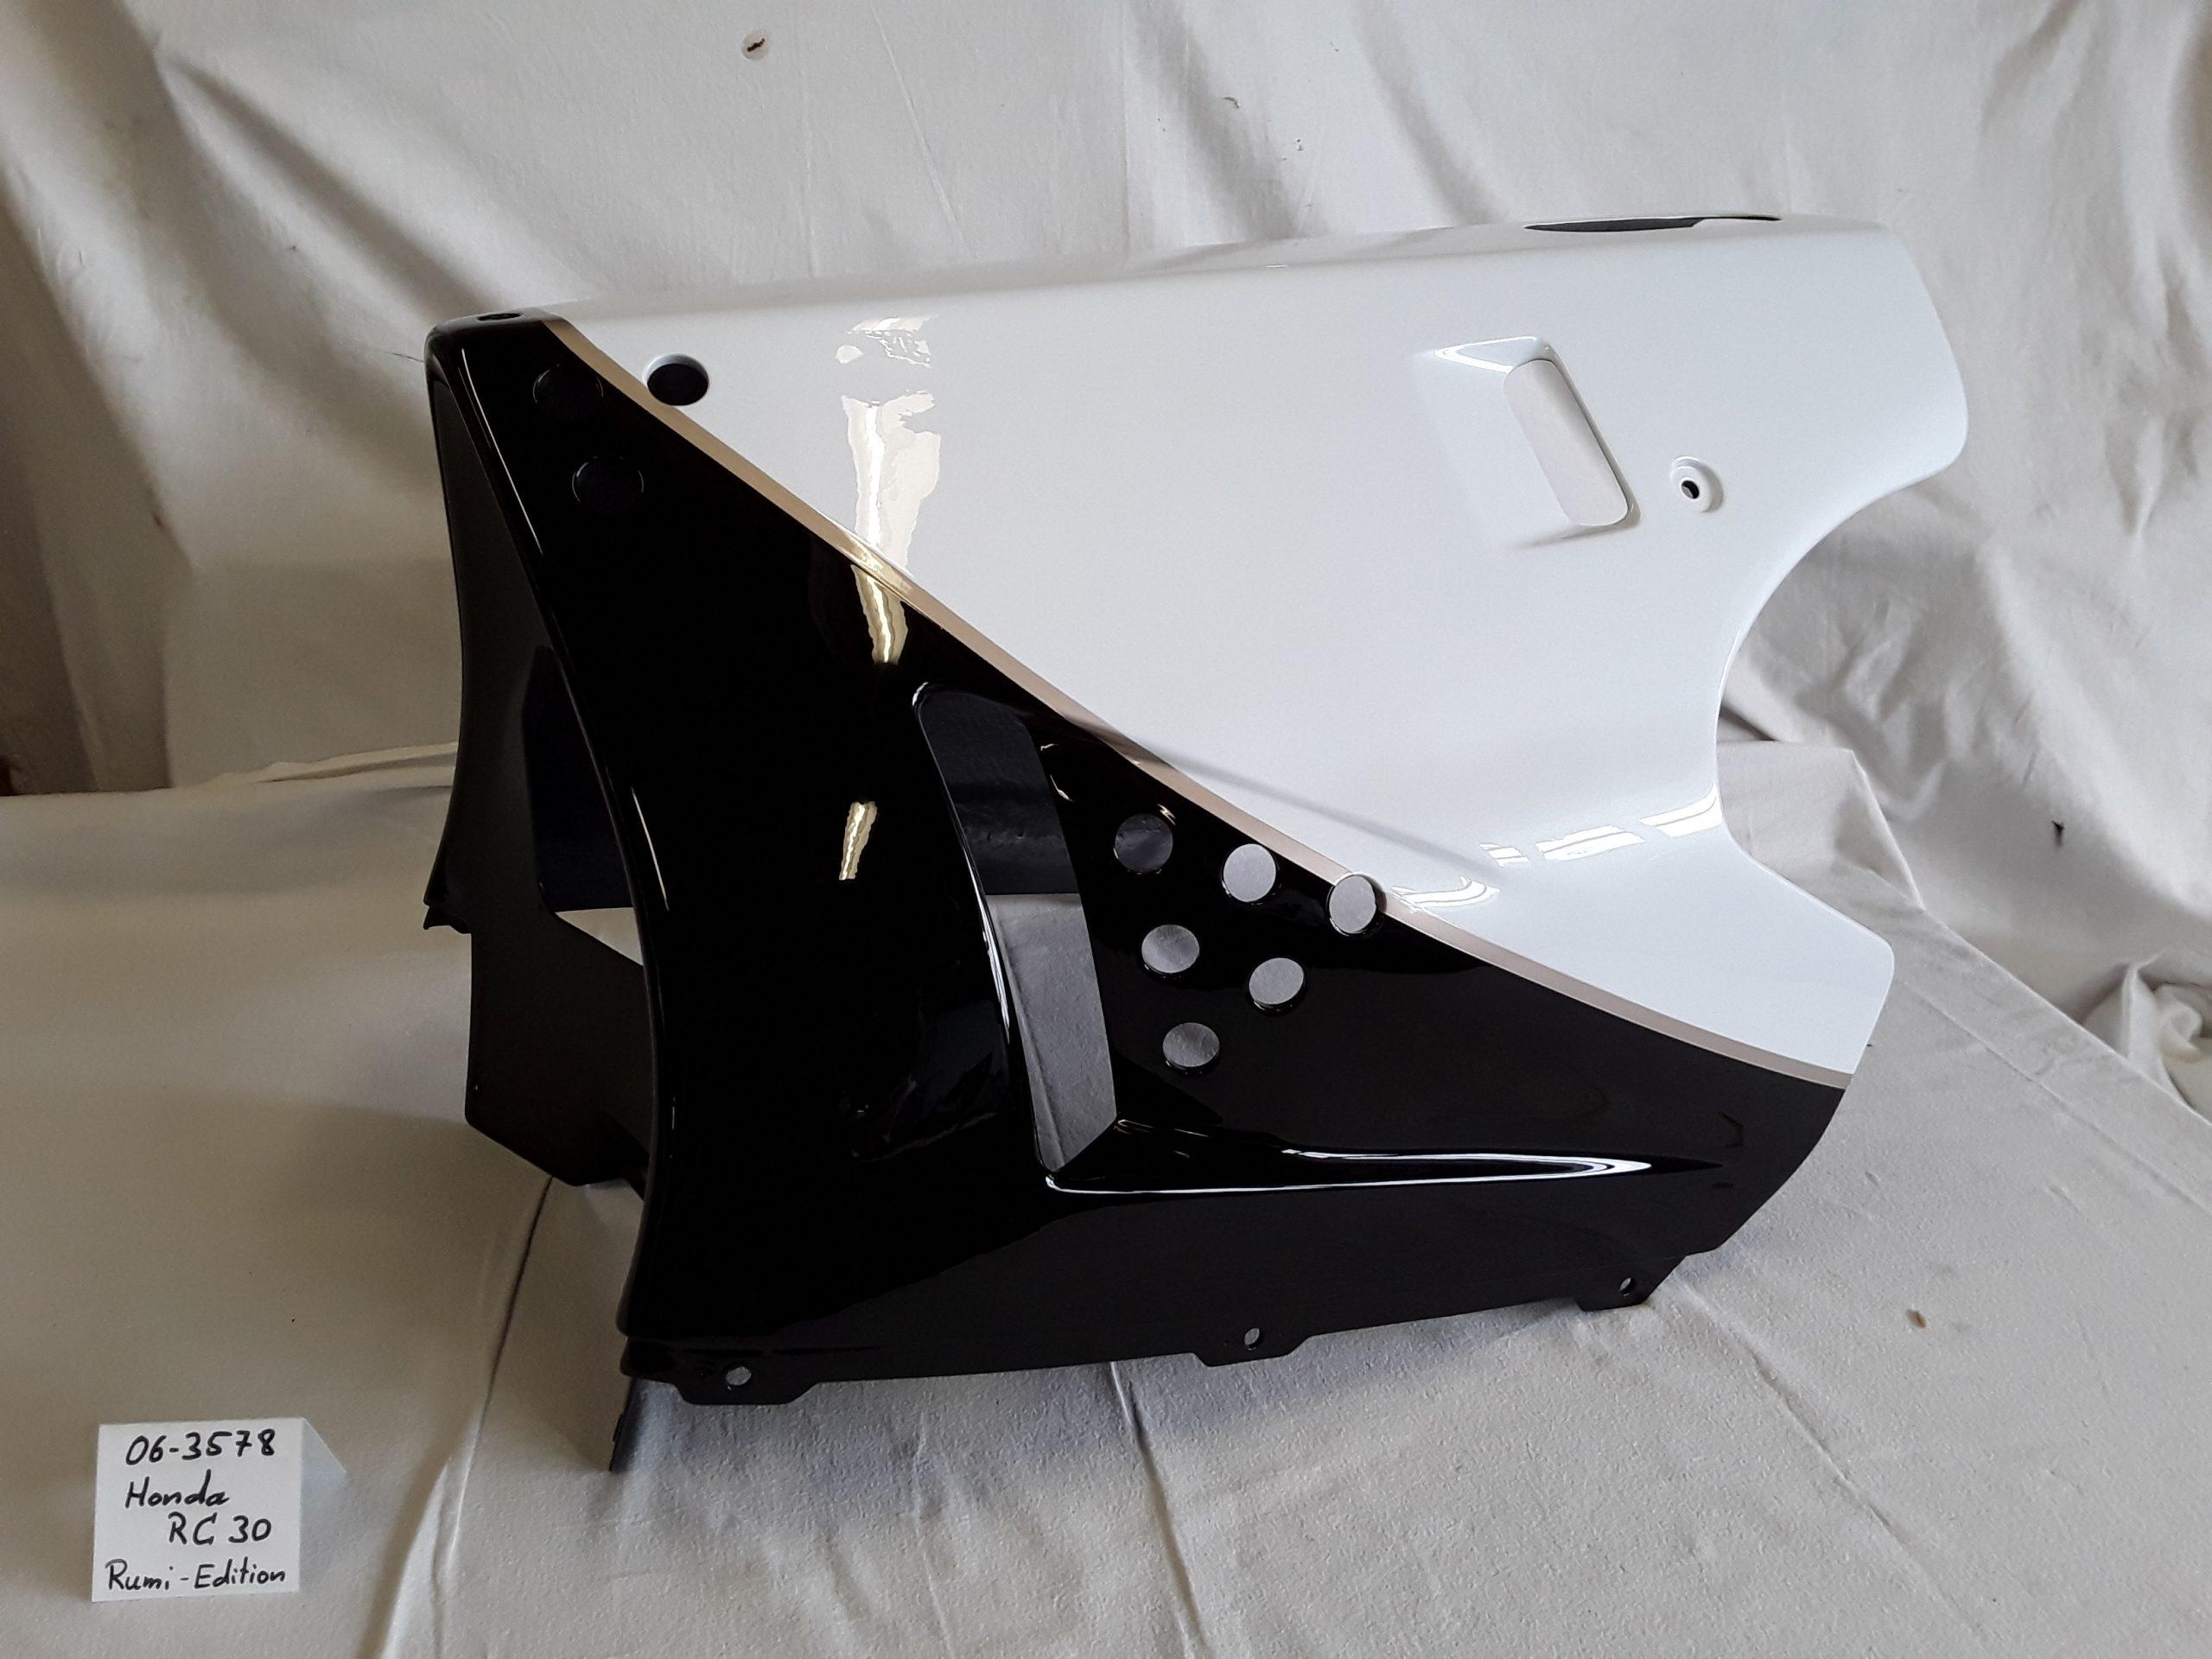 Honda VFR750R Rumi-Edition in pearl crystal white NH-193 und black NH-1 RH-Lacke Lackiererei Motorradlackierung 06-3578